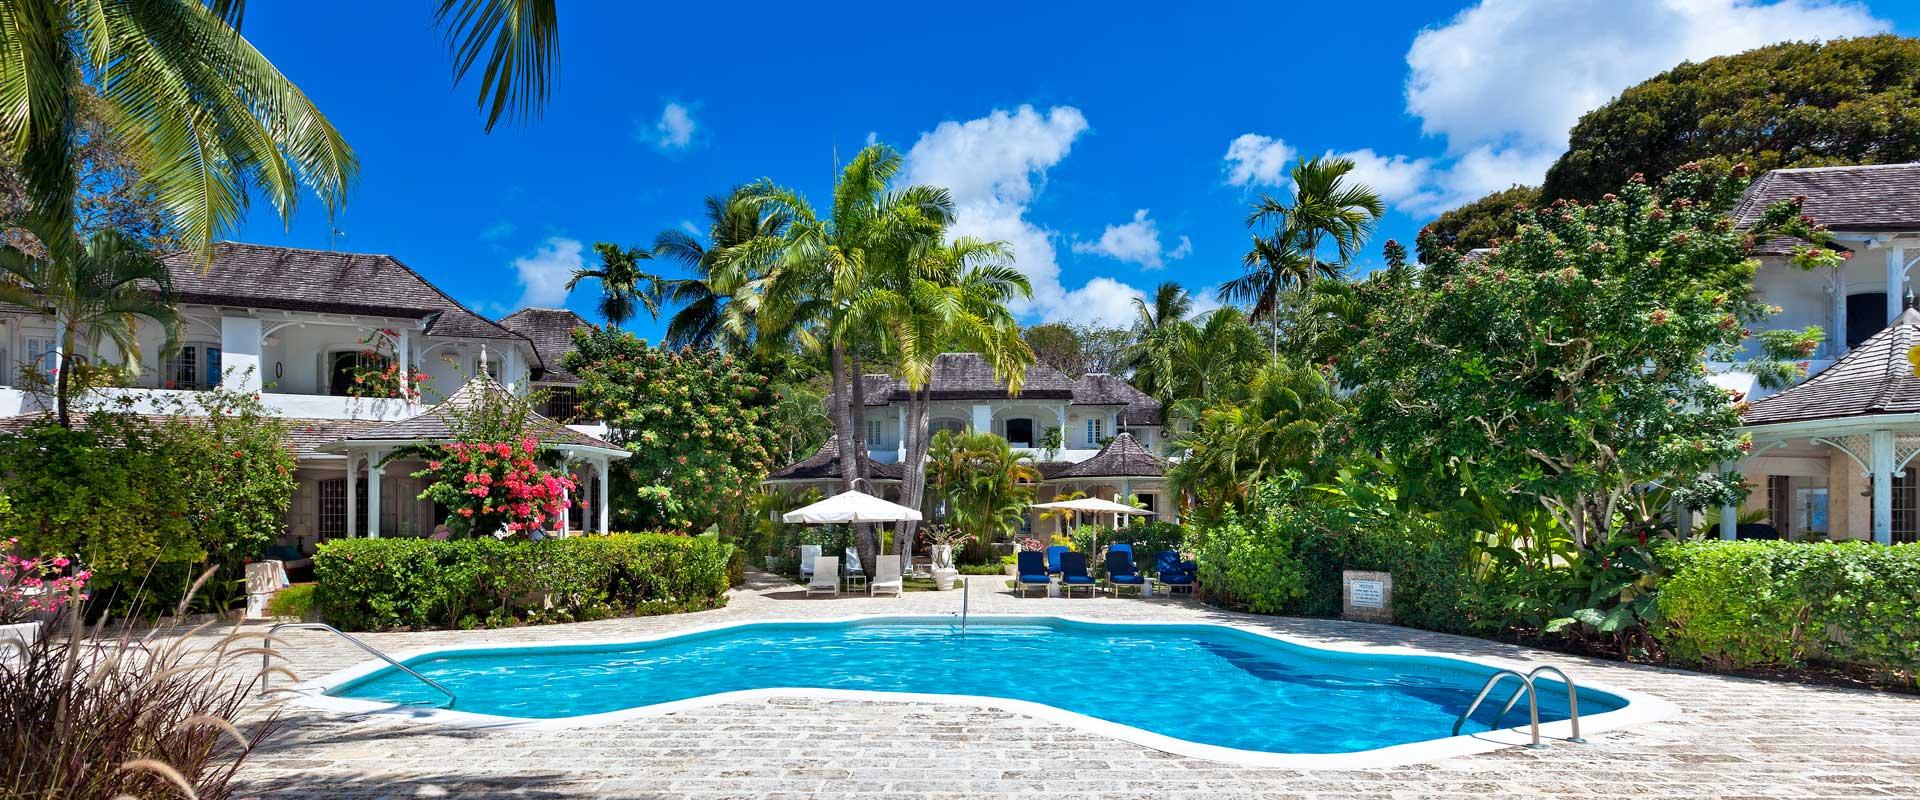 Emerald Beach 3 Villa Emerald Beach 3 Barbados Isle Blue